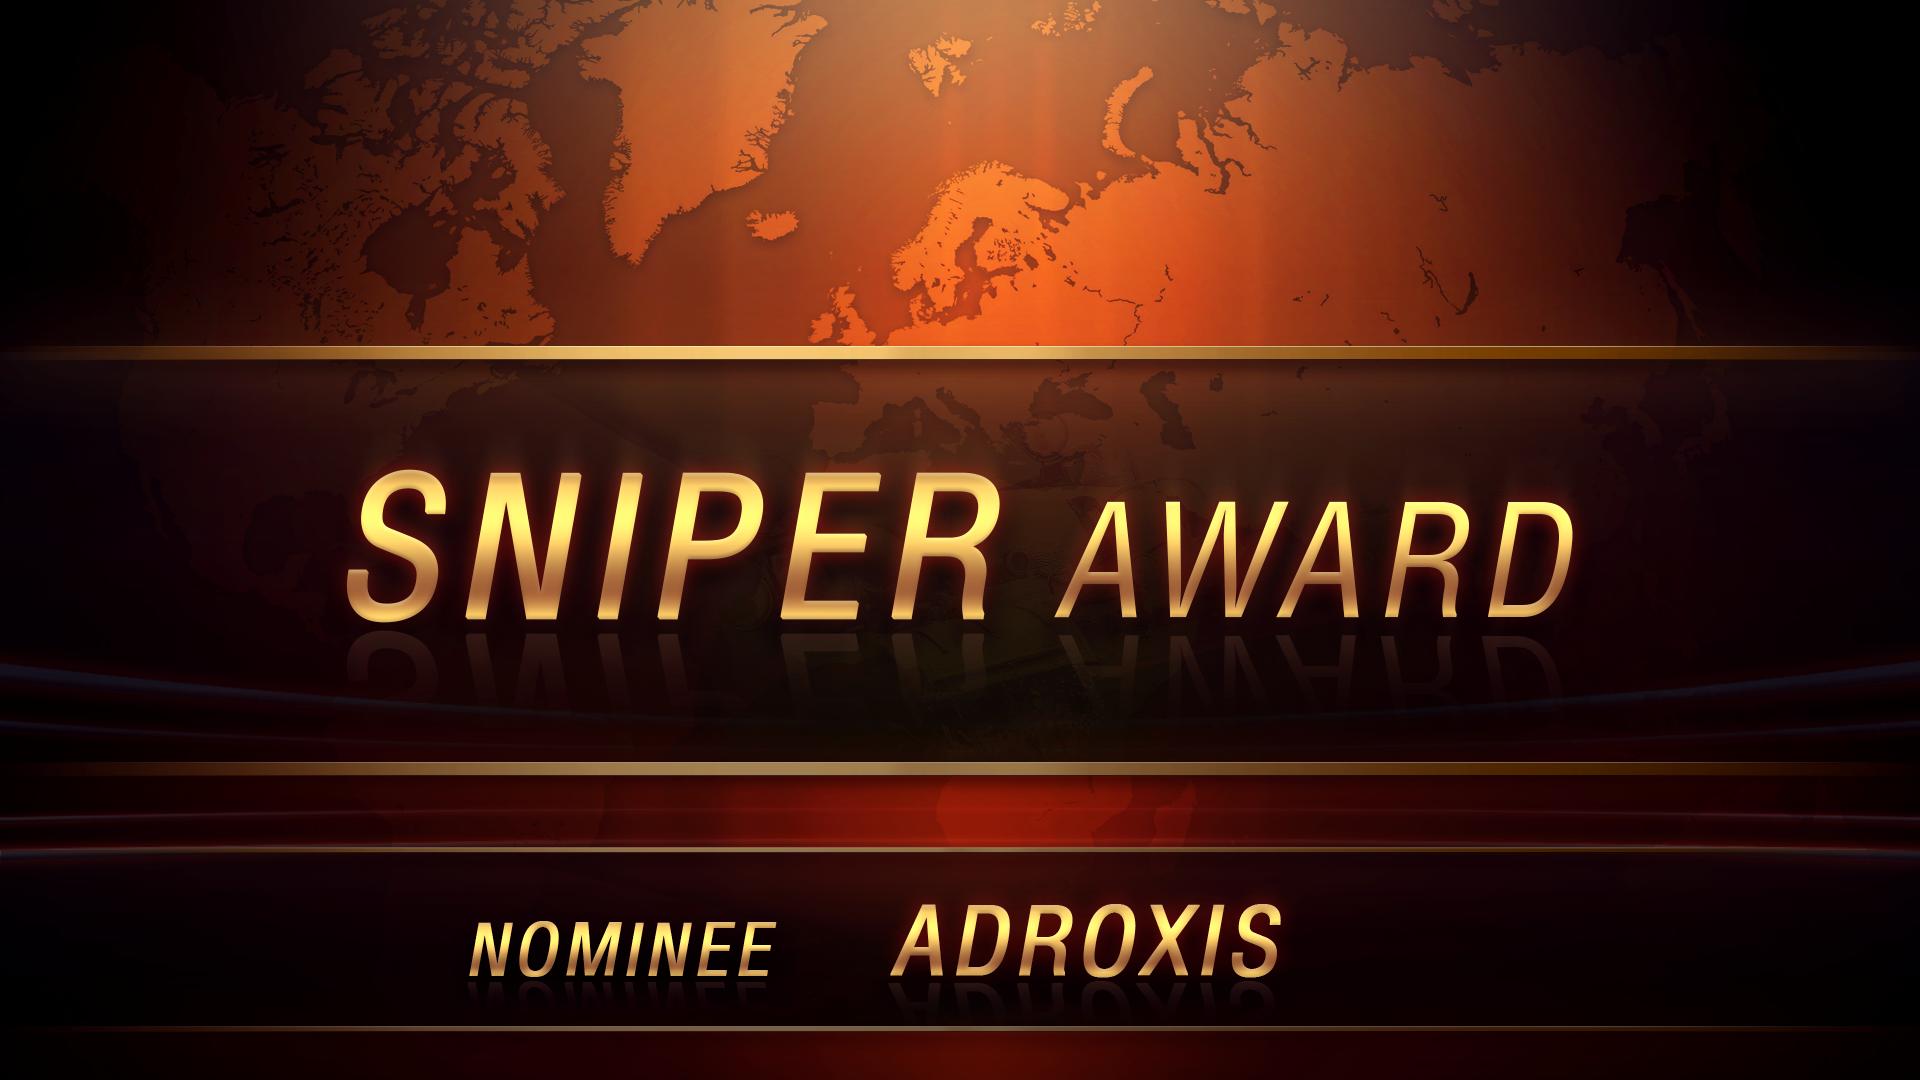 Sniper-Adroxis.png